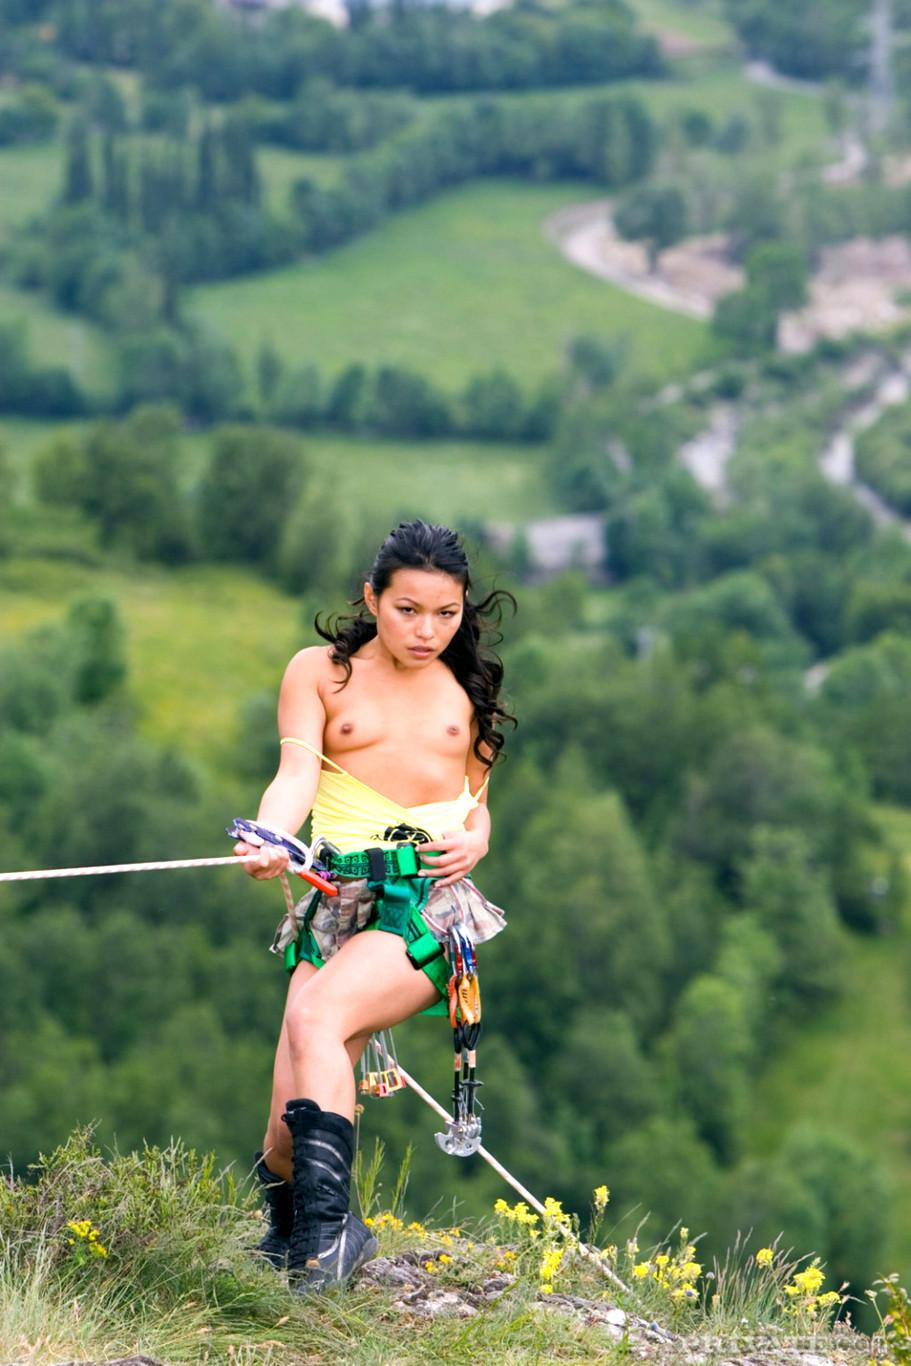 Sex rock climbing